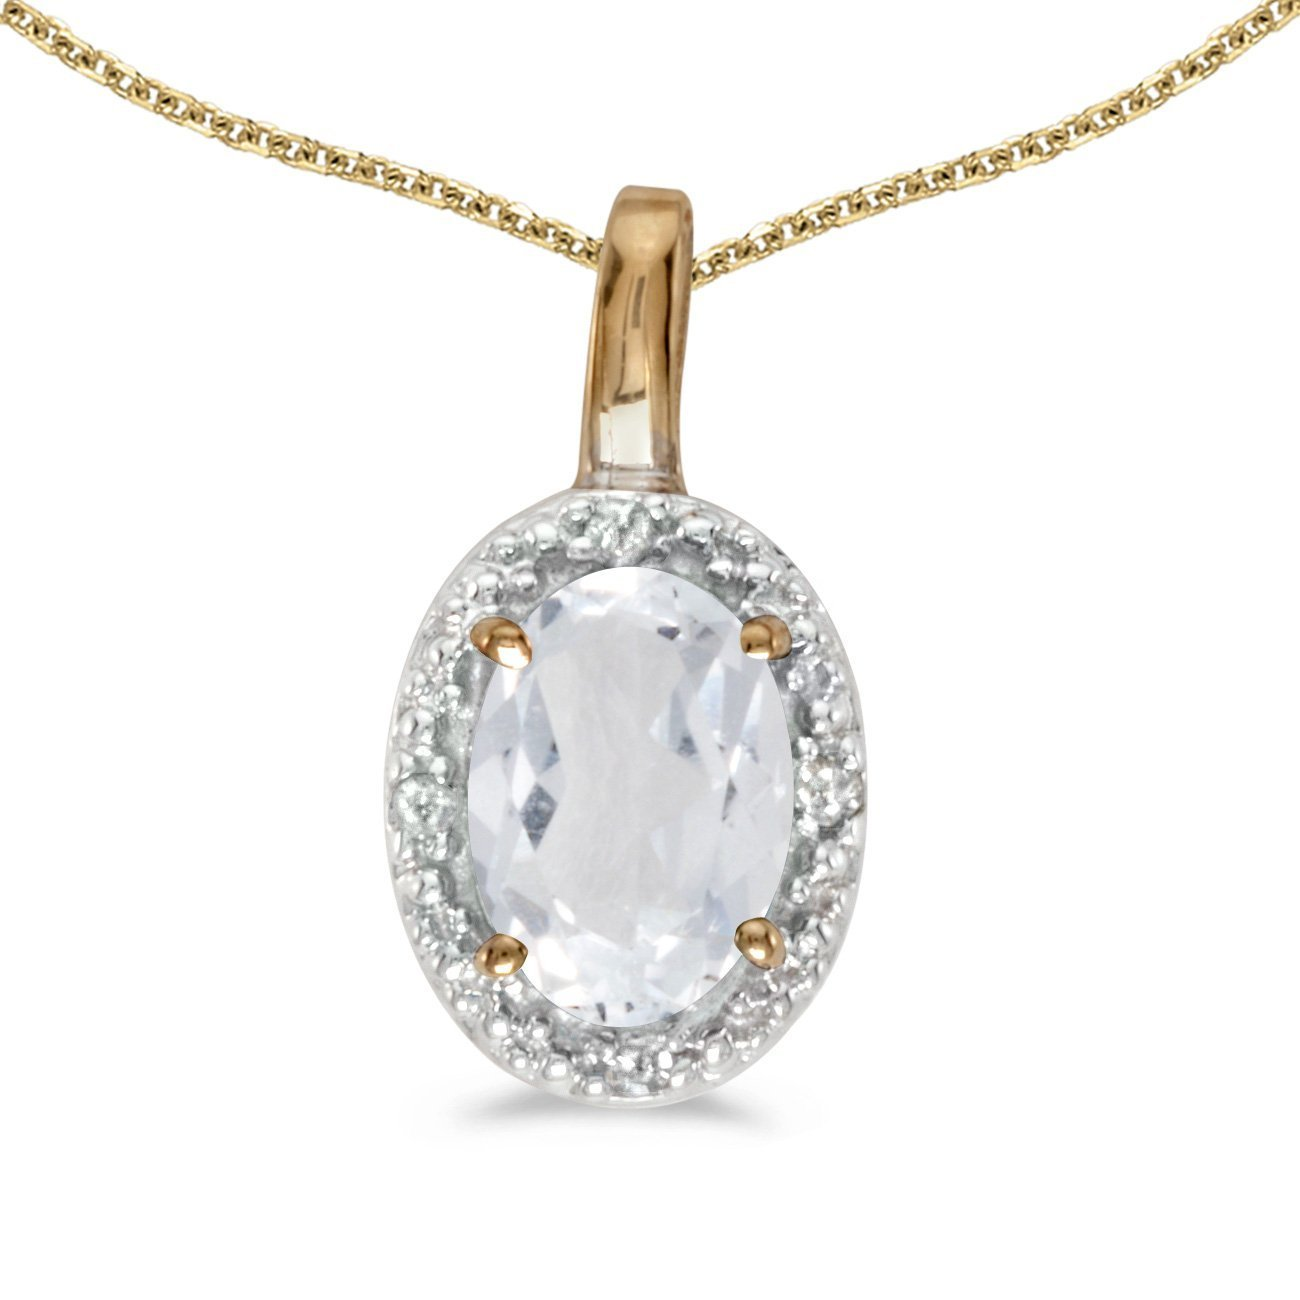 FB Jewels Solid 14k Yellow Gold Genuine Birthstone Oval Gemstone And Diamond Pendant 0.47 Cttw.